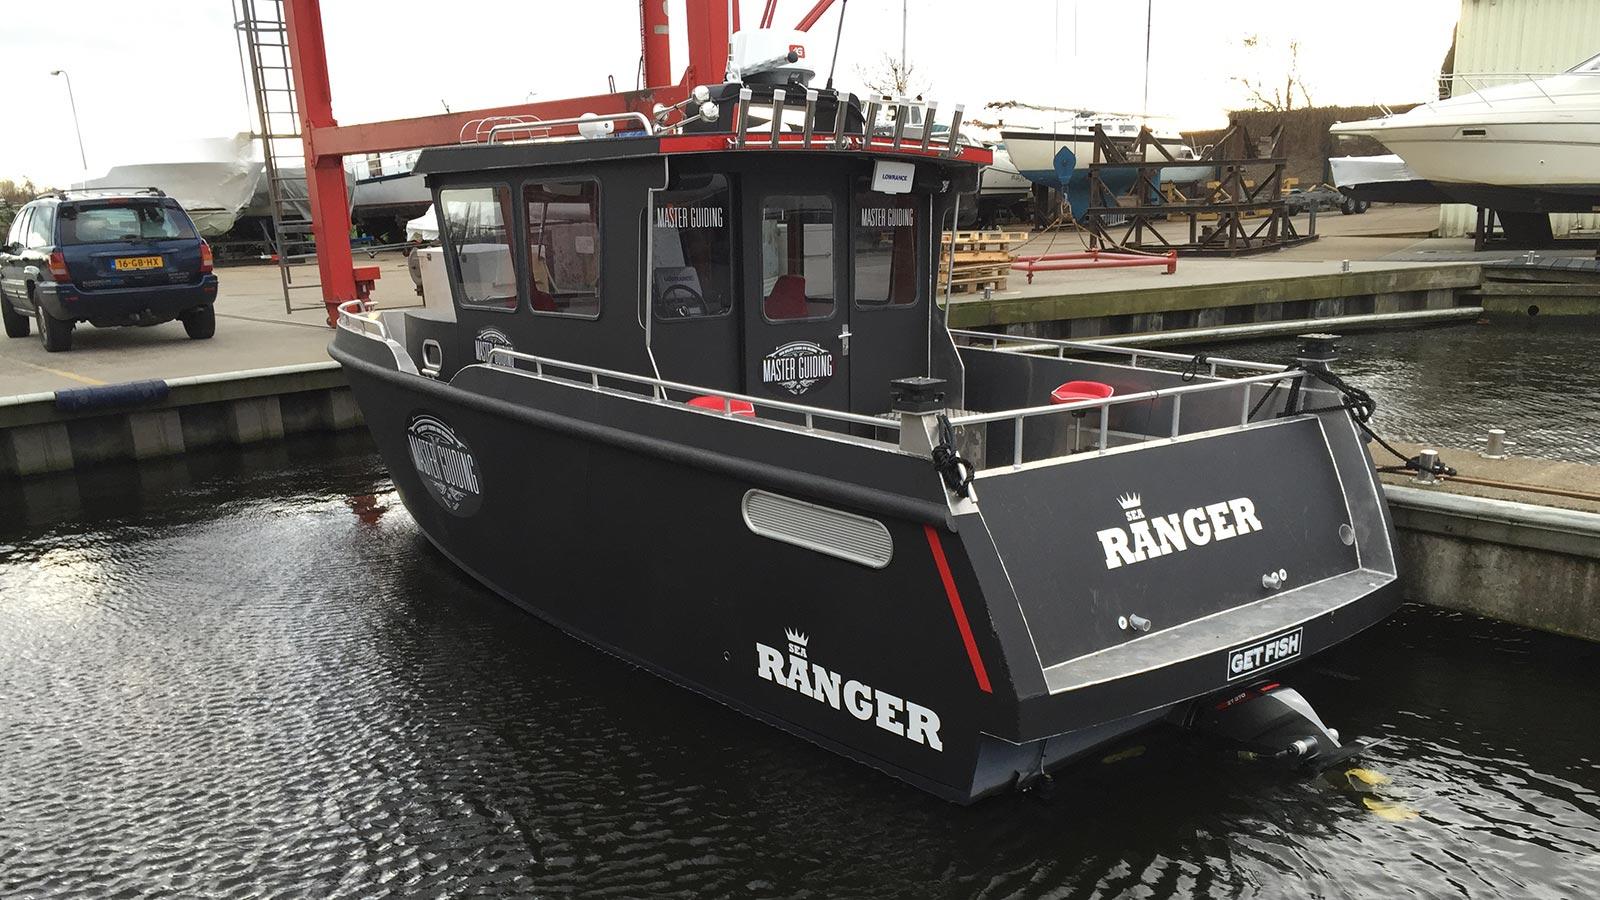 Modellen AluminiumJon.nl - Patrol serie - 8 meter - Sea Ranger